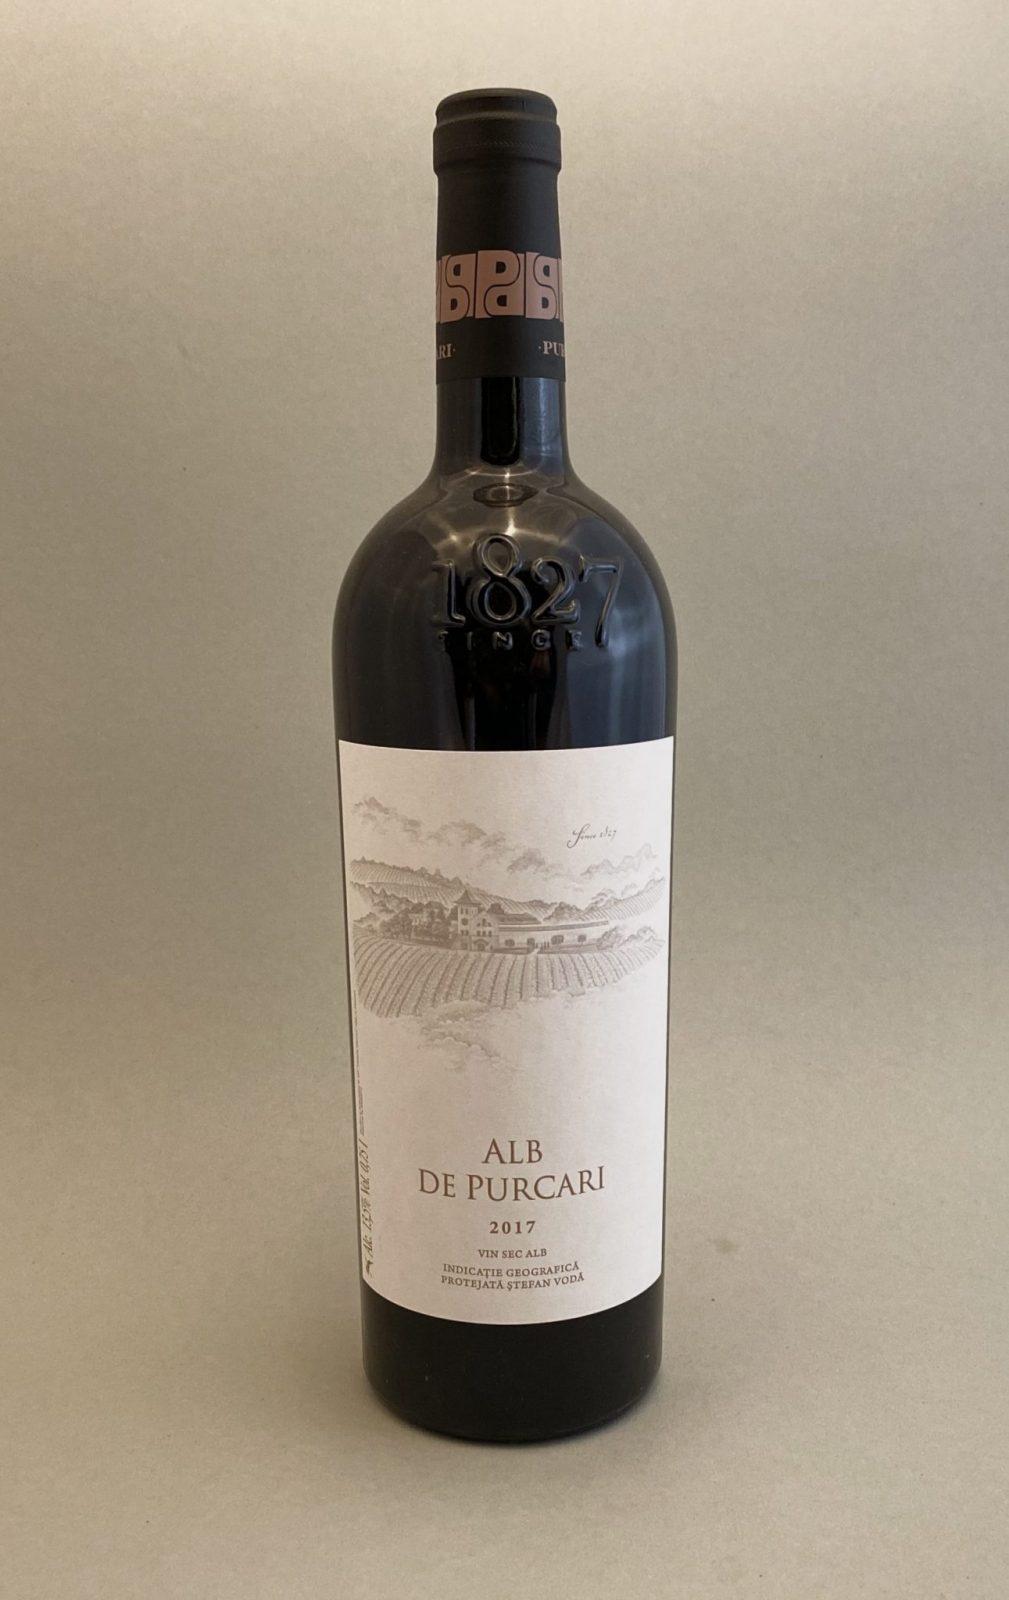 Chateau PURCARI Alb De Purcari 2017, vinoteka Sunny wines slnecnice mesto, Bratislava petrzalka, vino červené z Moldavska